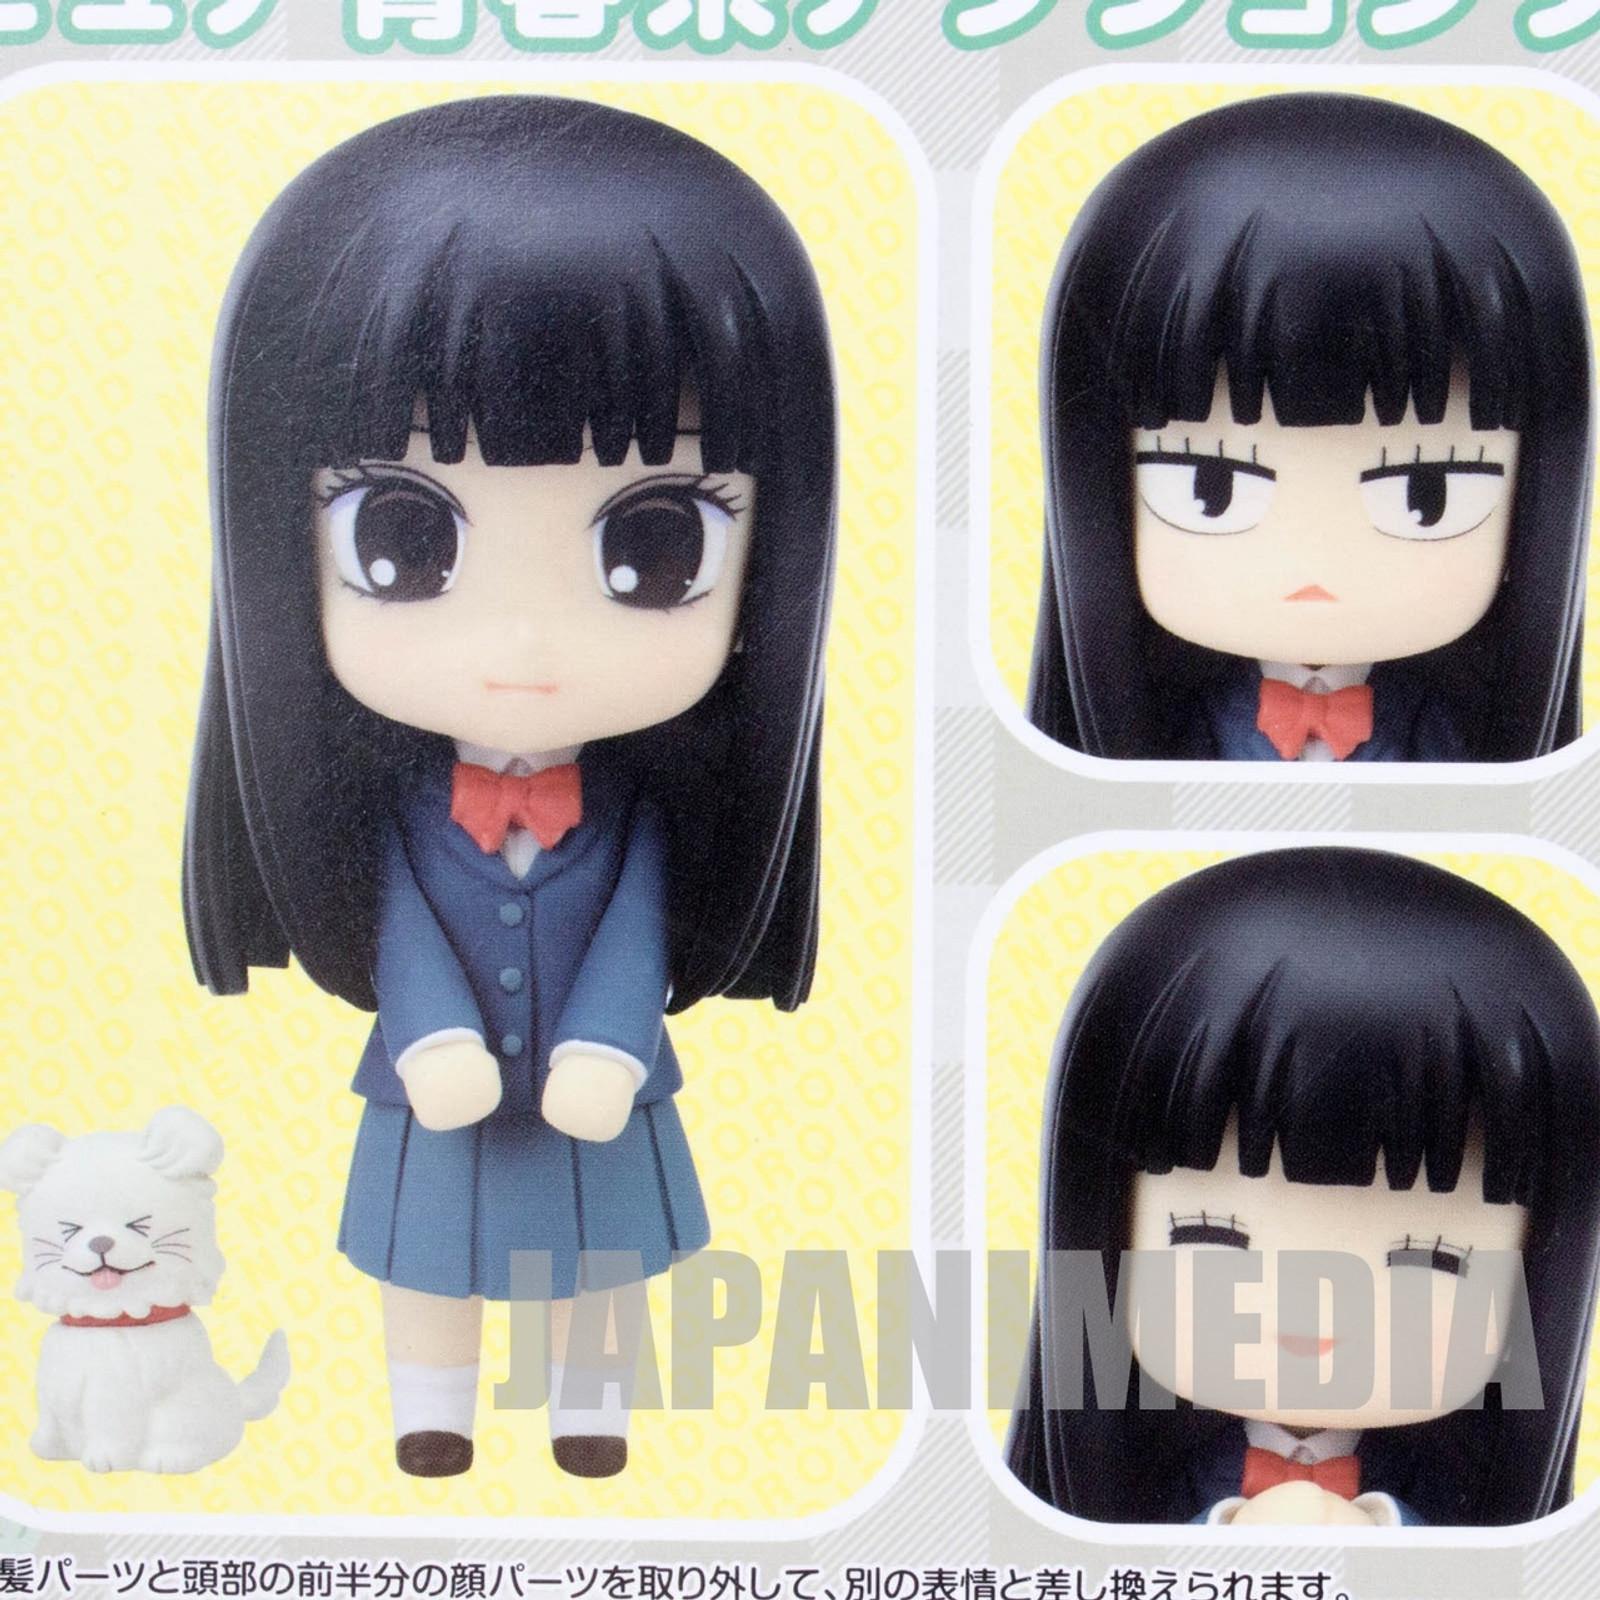 RARE! Kimi ni Todoke Sawako Kuronuma Nendoroid Figure Set JAPAN ANIME